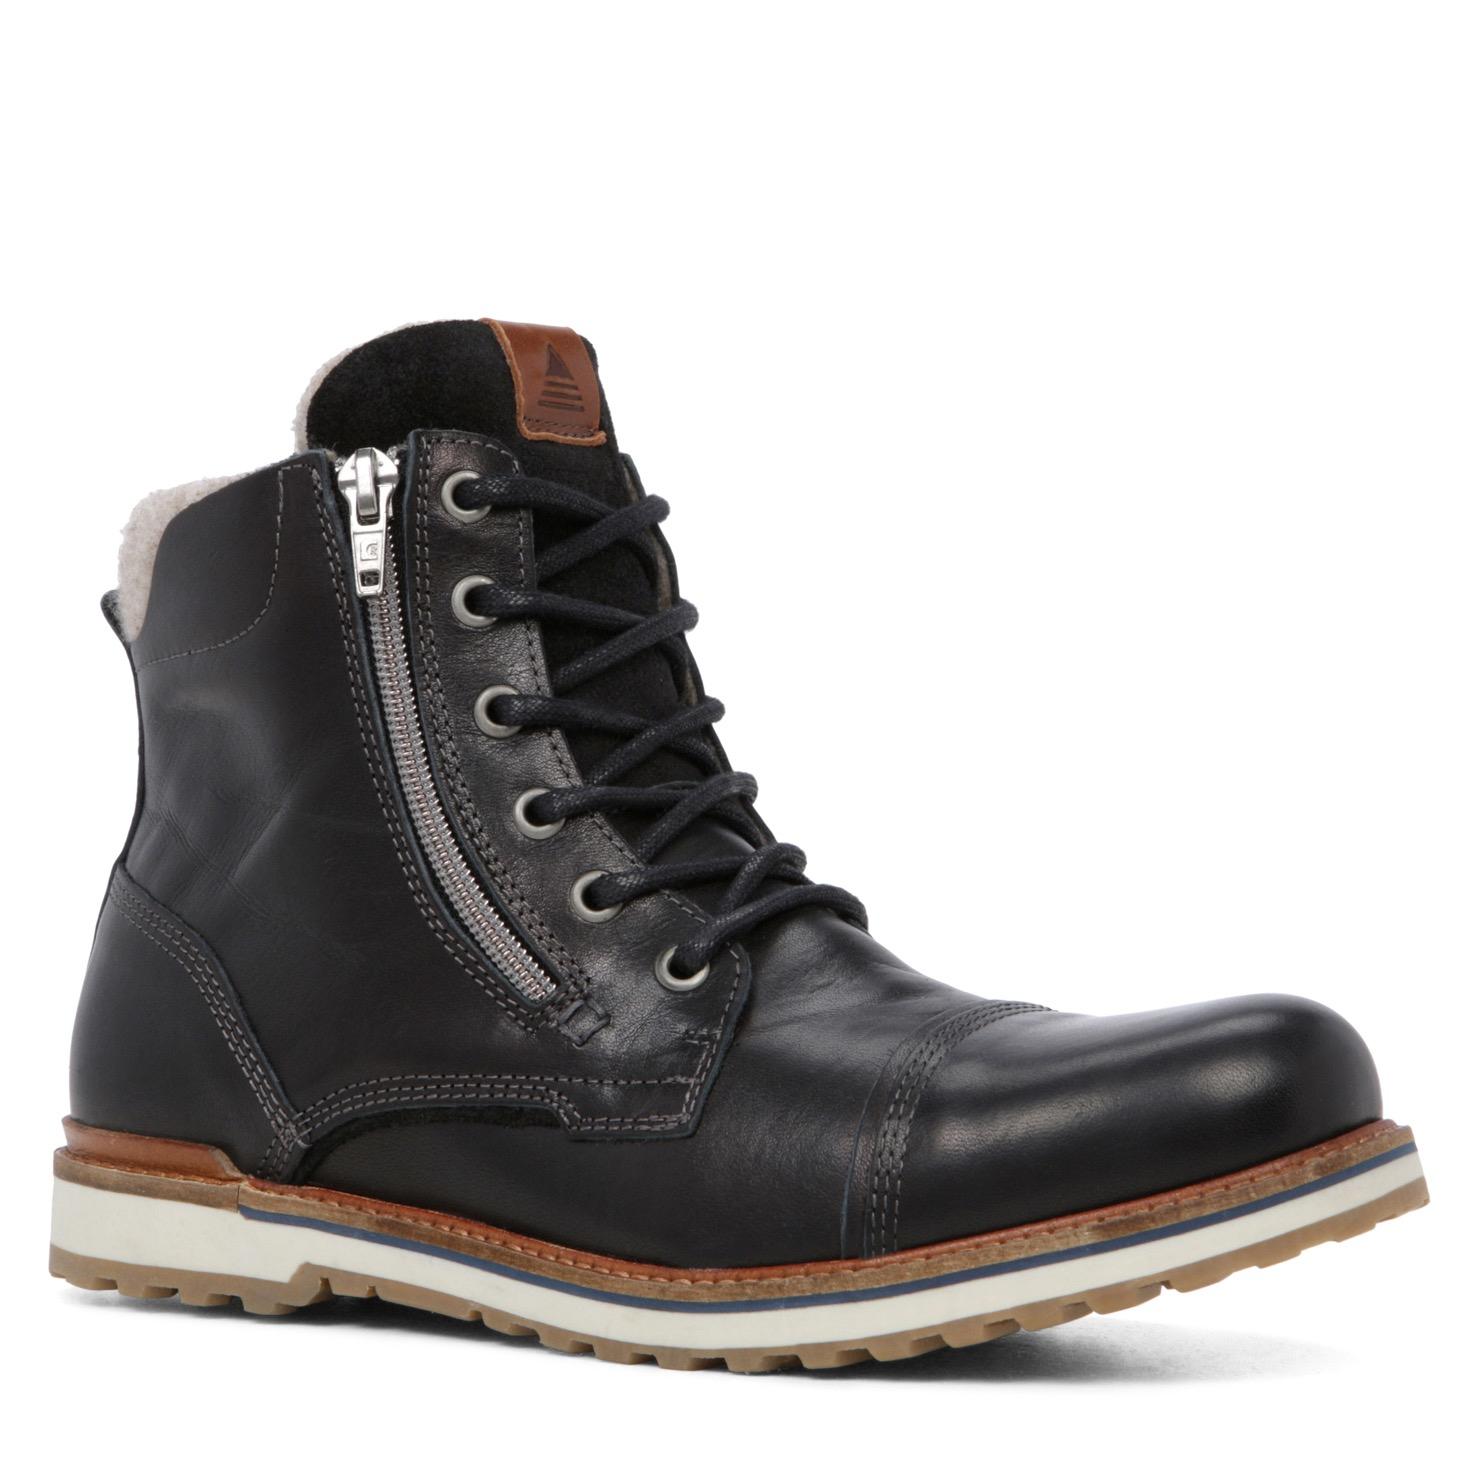 Aldo Shoes Leather Boots